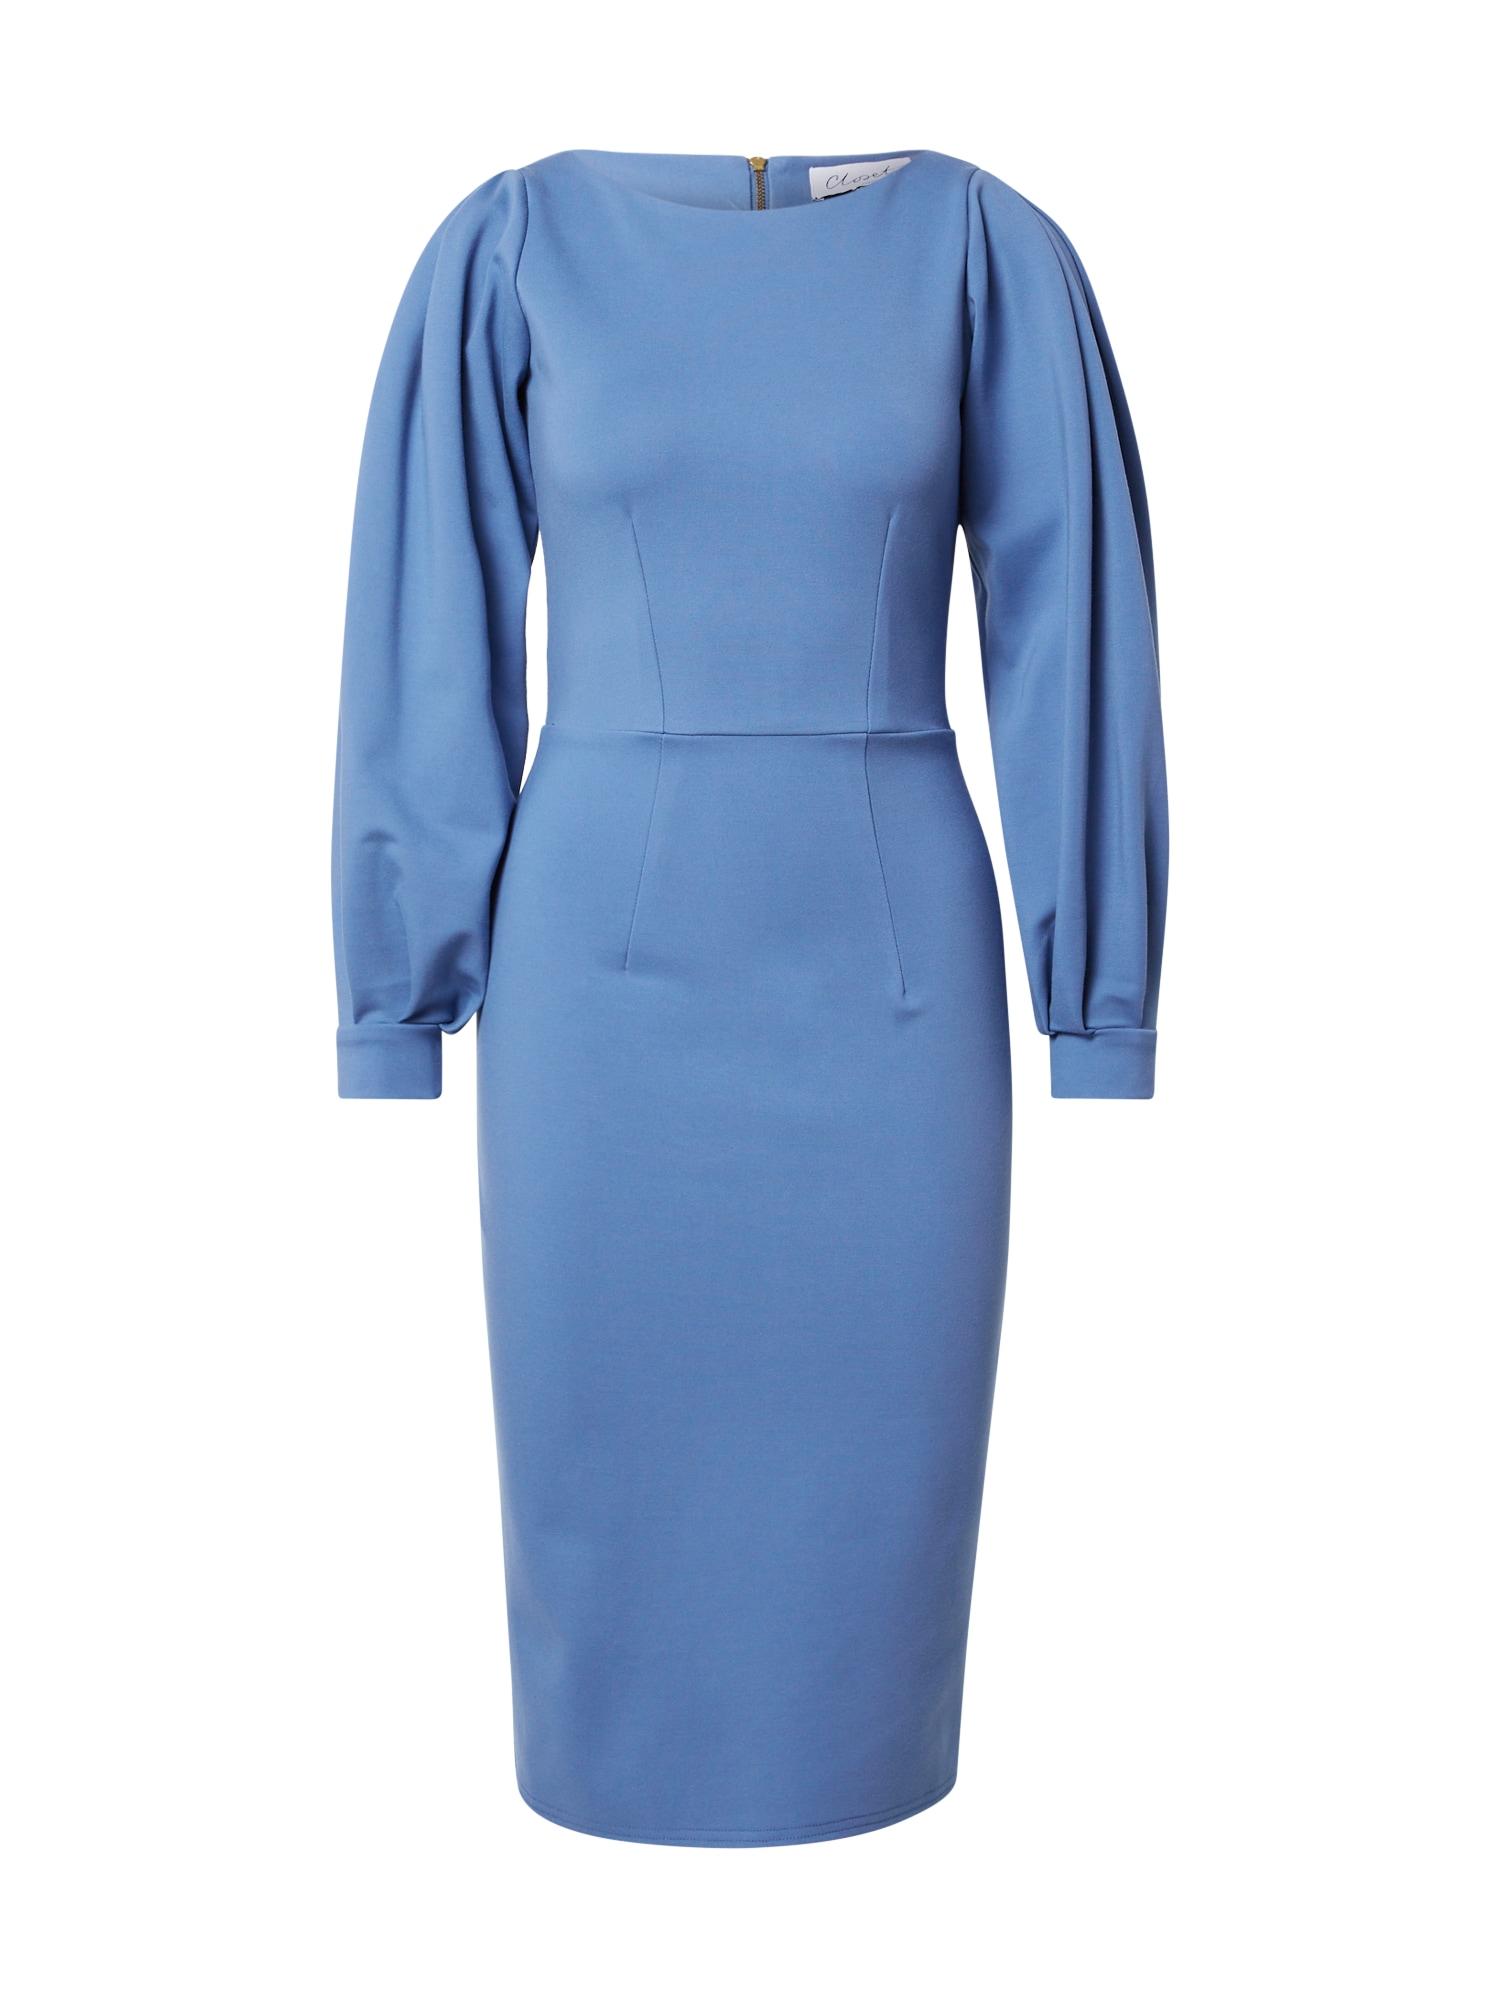 Closet London Suknelė mėlyna dūmų spalva